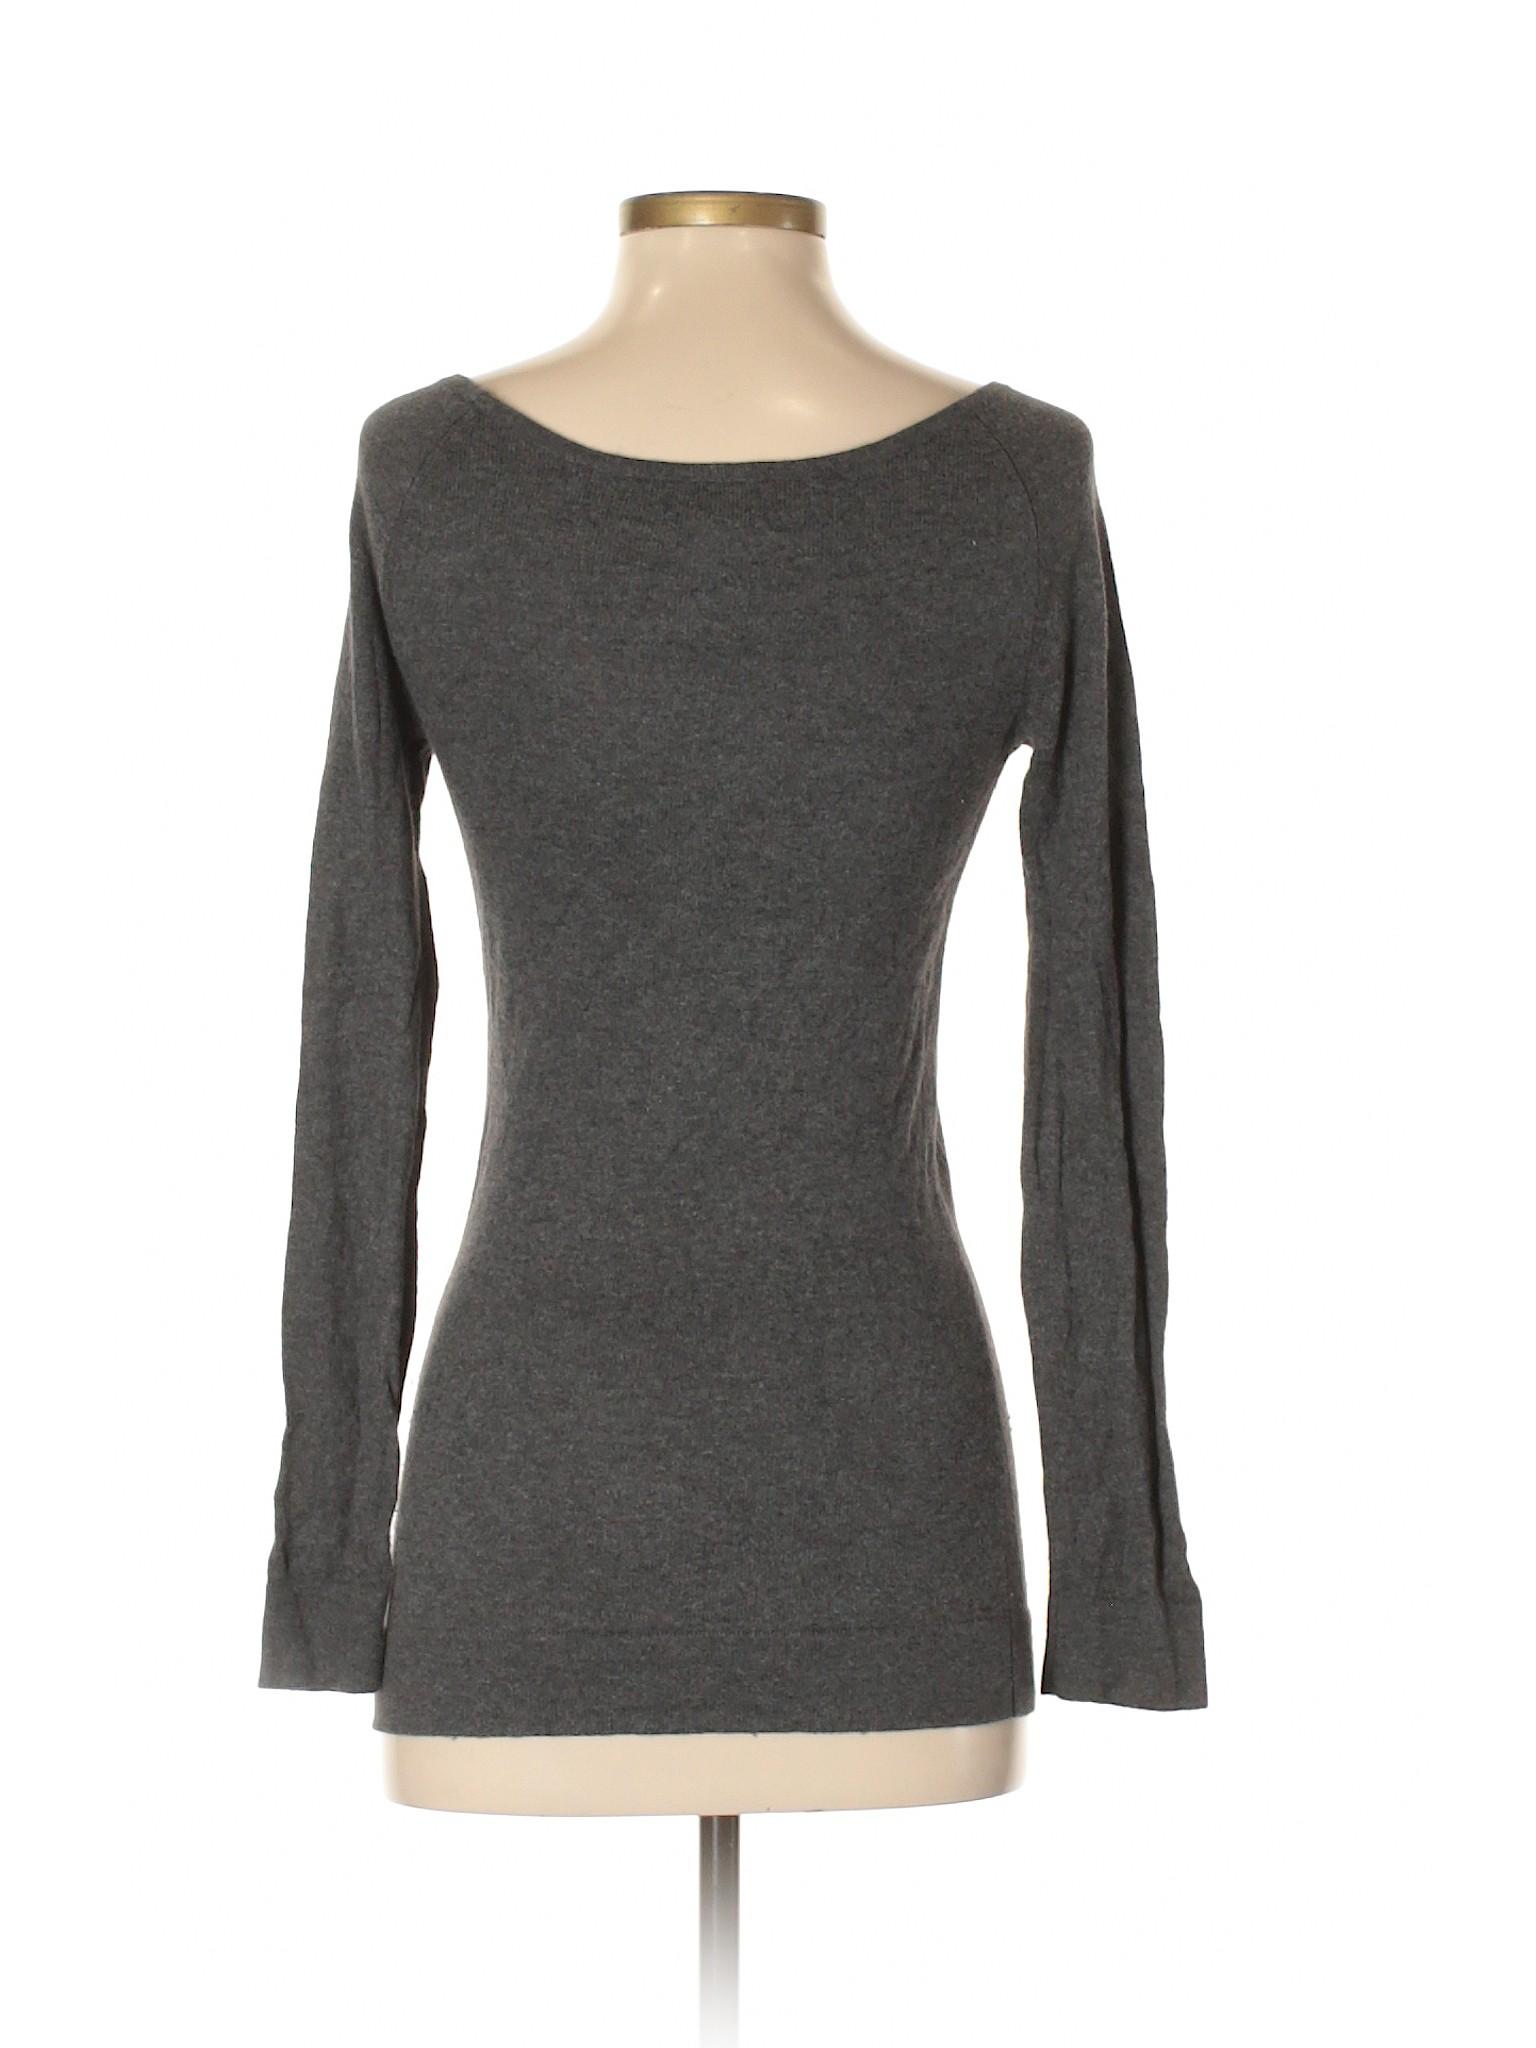 Store Pullover Boutique Sweater Factory Banana Republic qwvYxptU